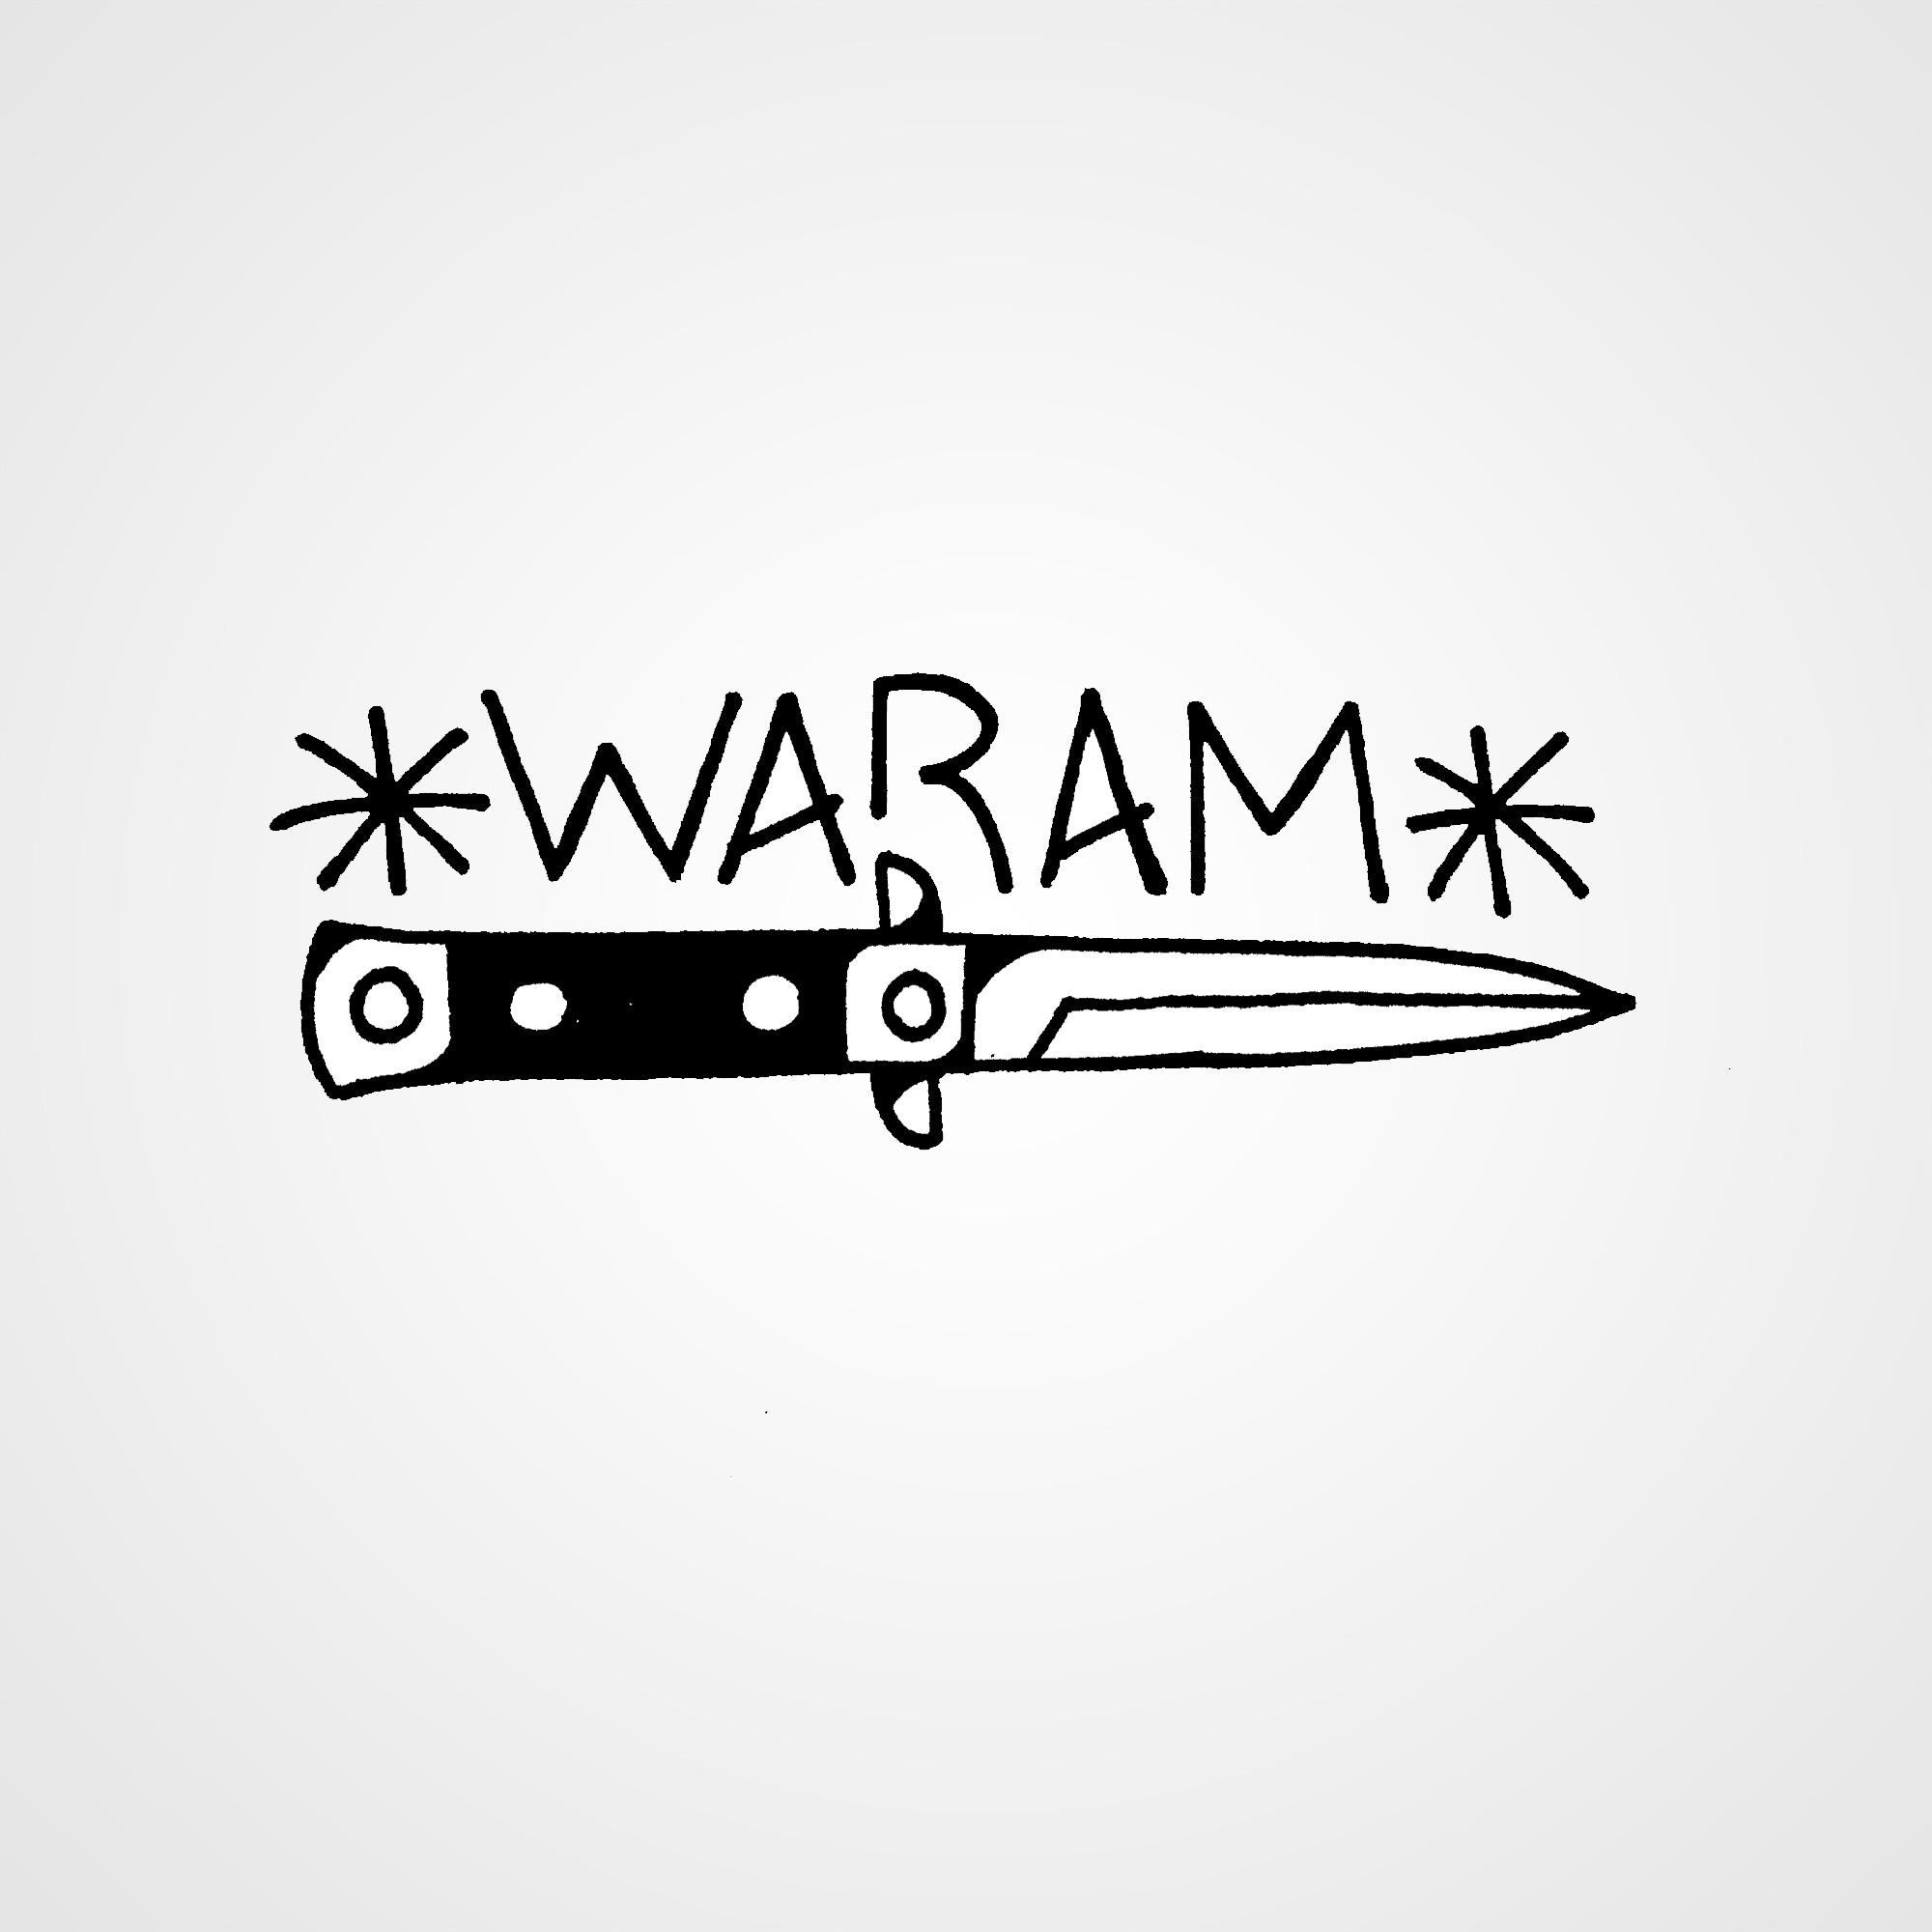 Waram